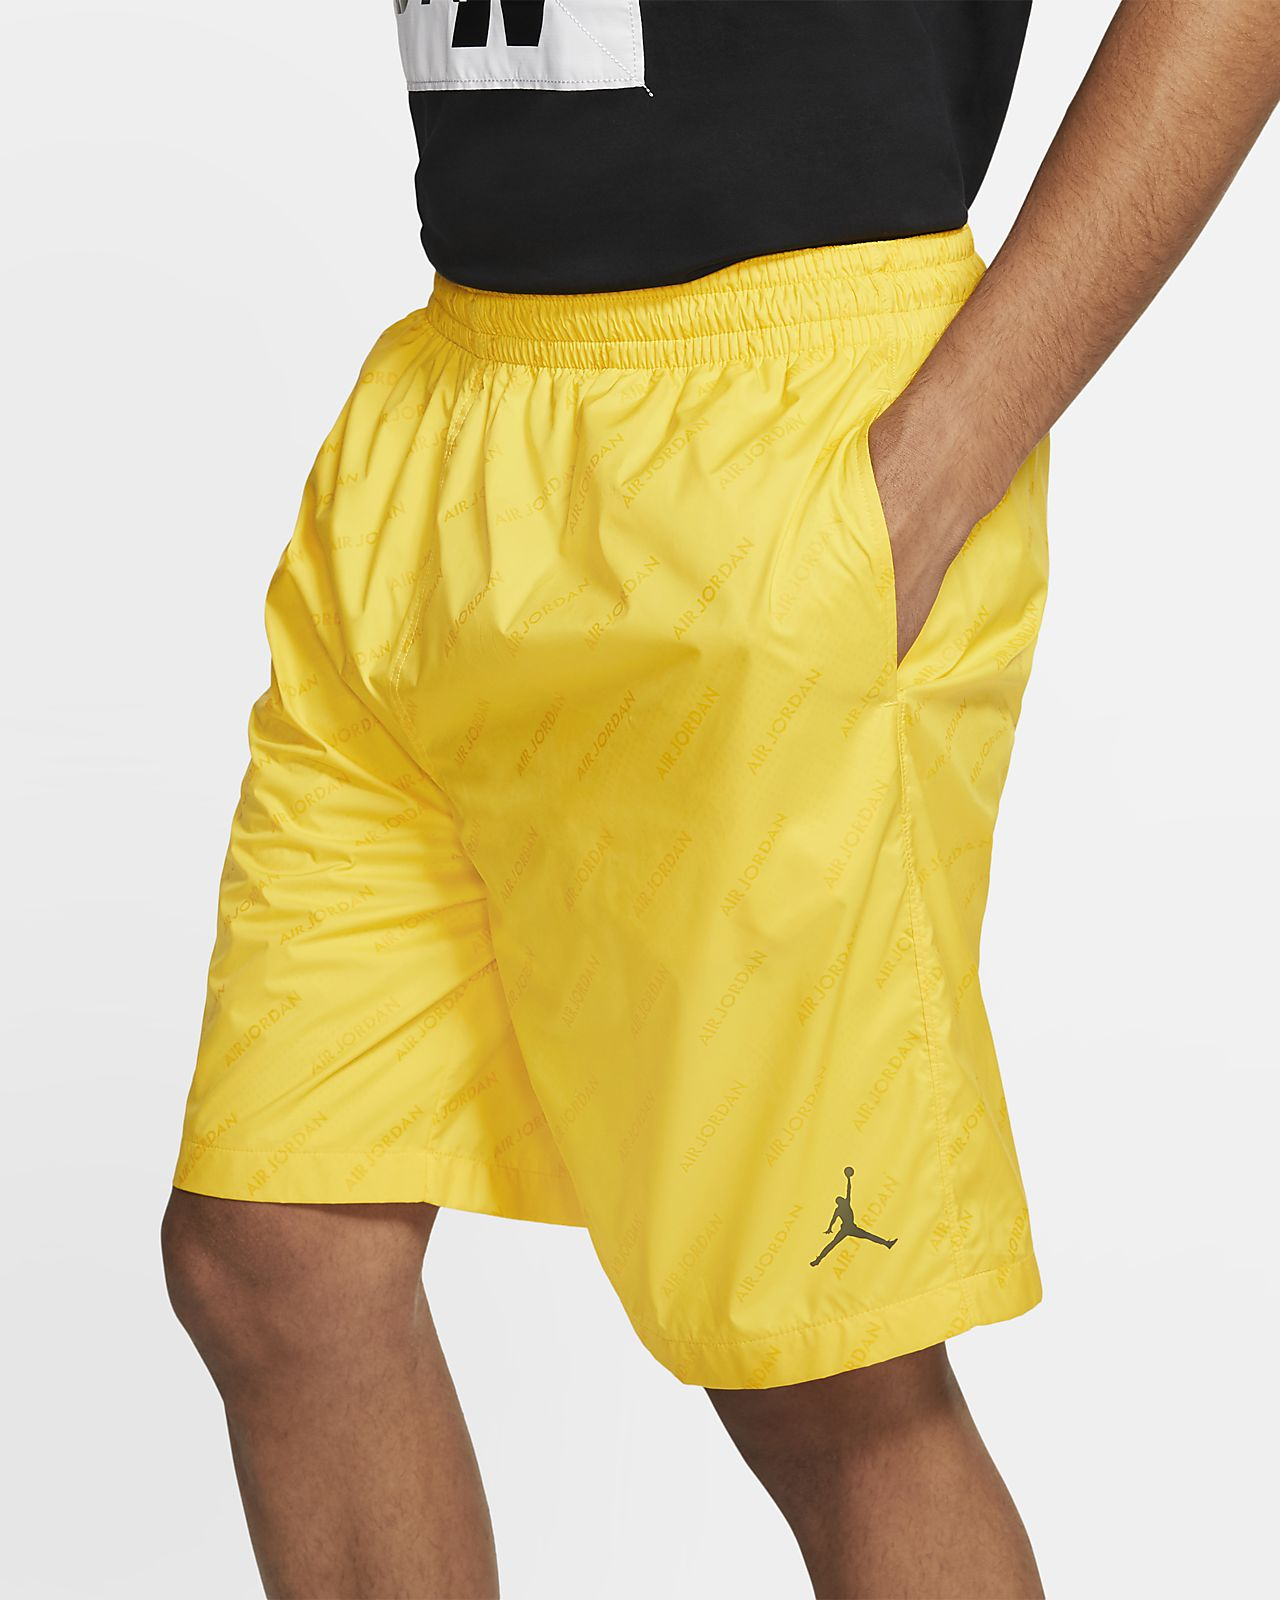 Jordan Legacy AJ4 Pantalons curts - Home